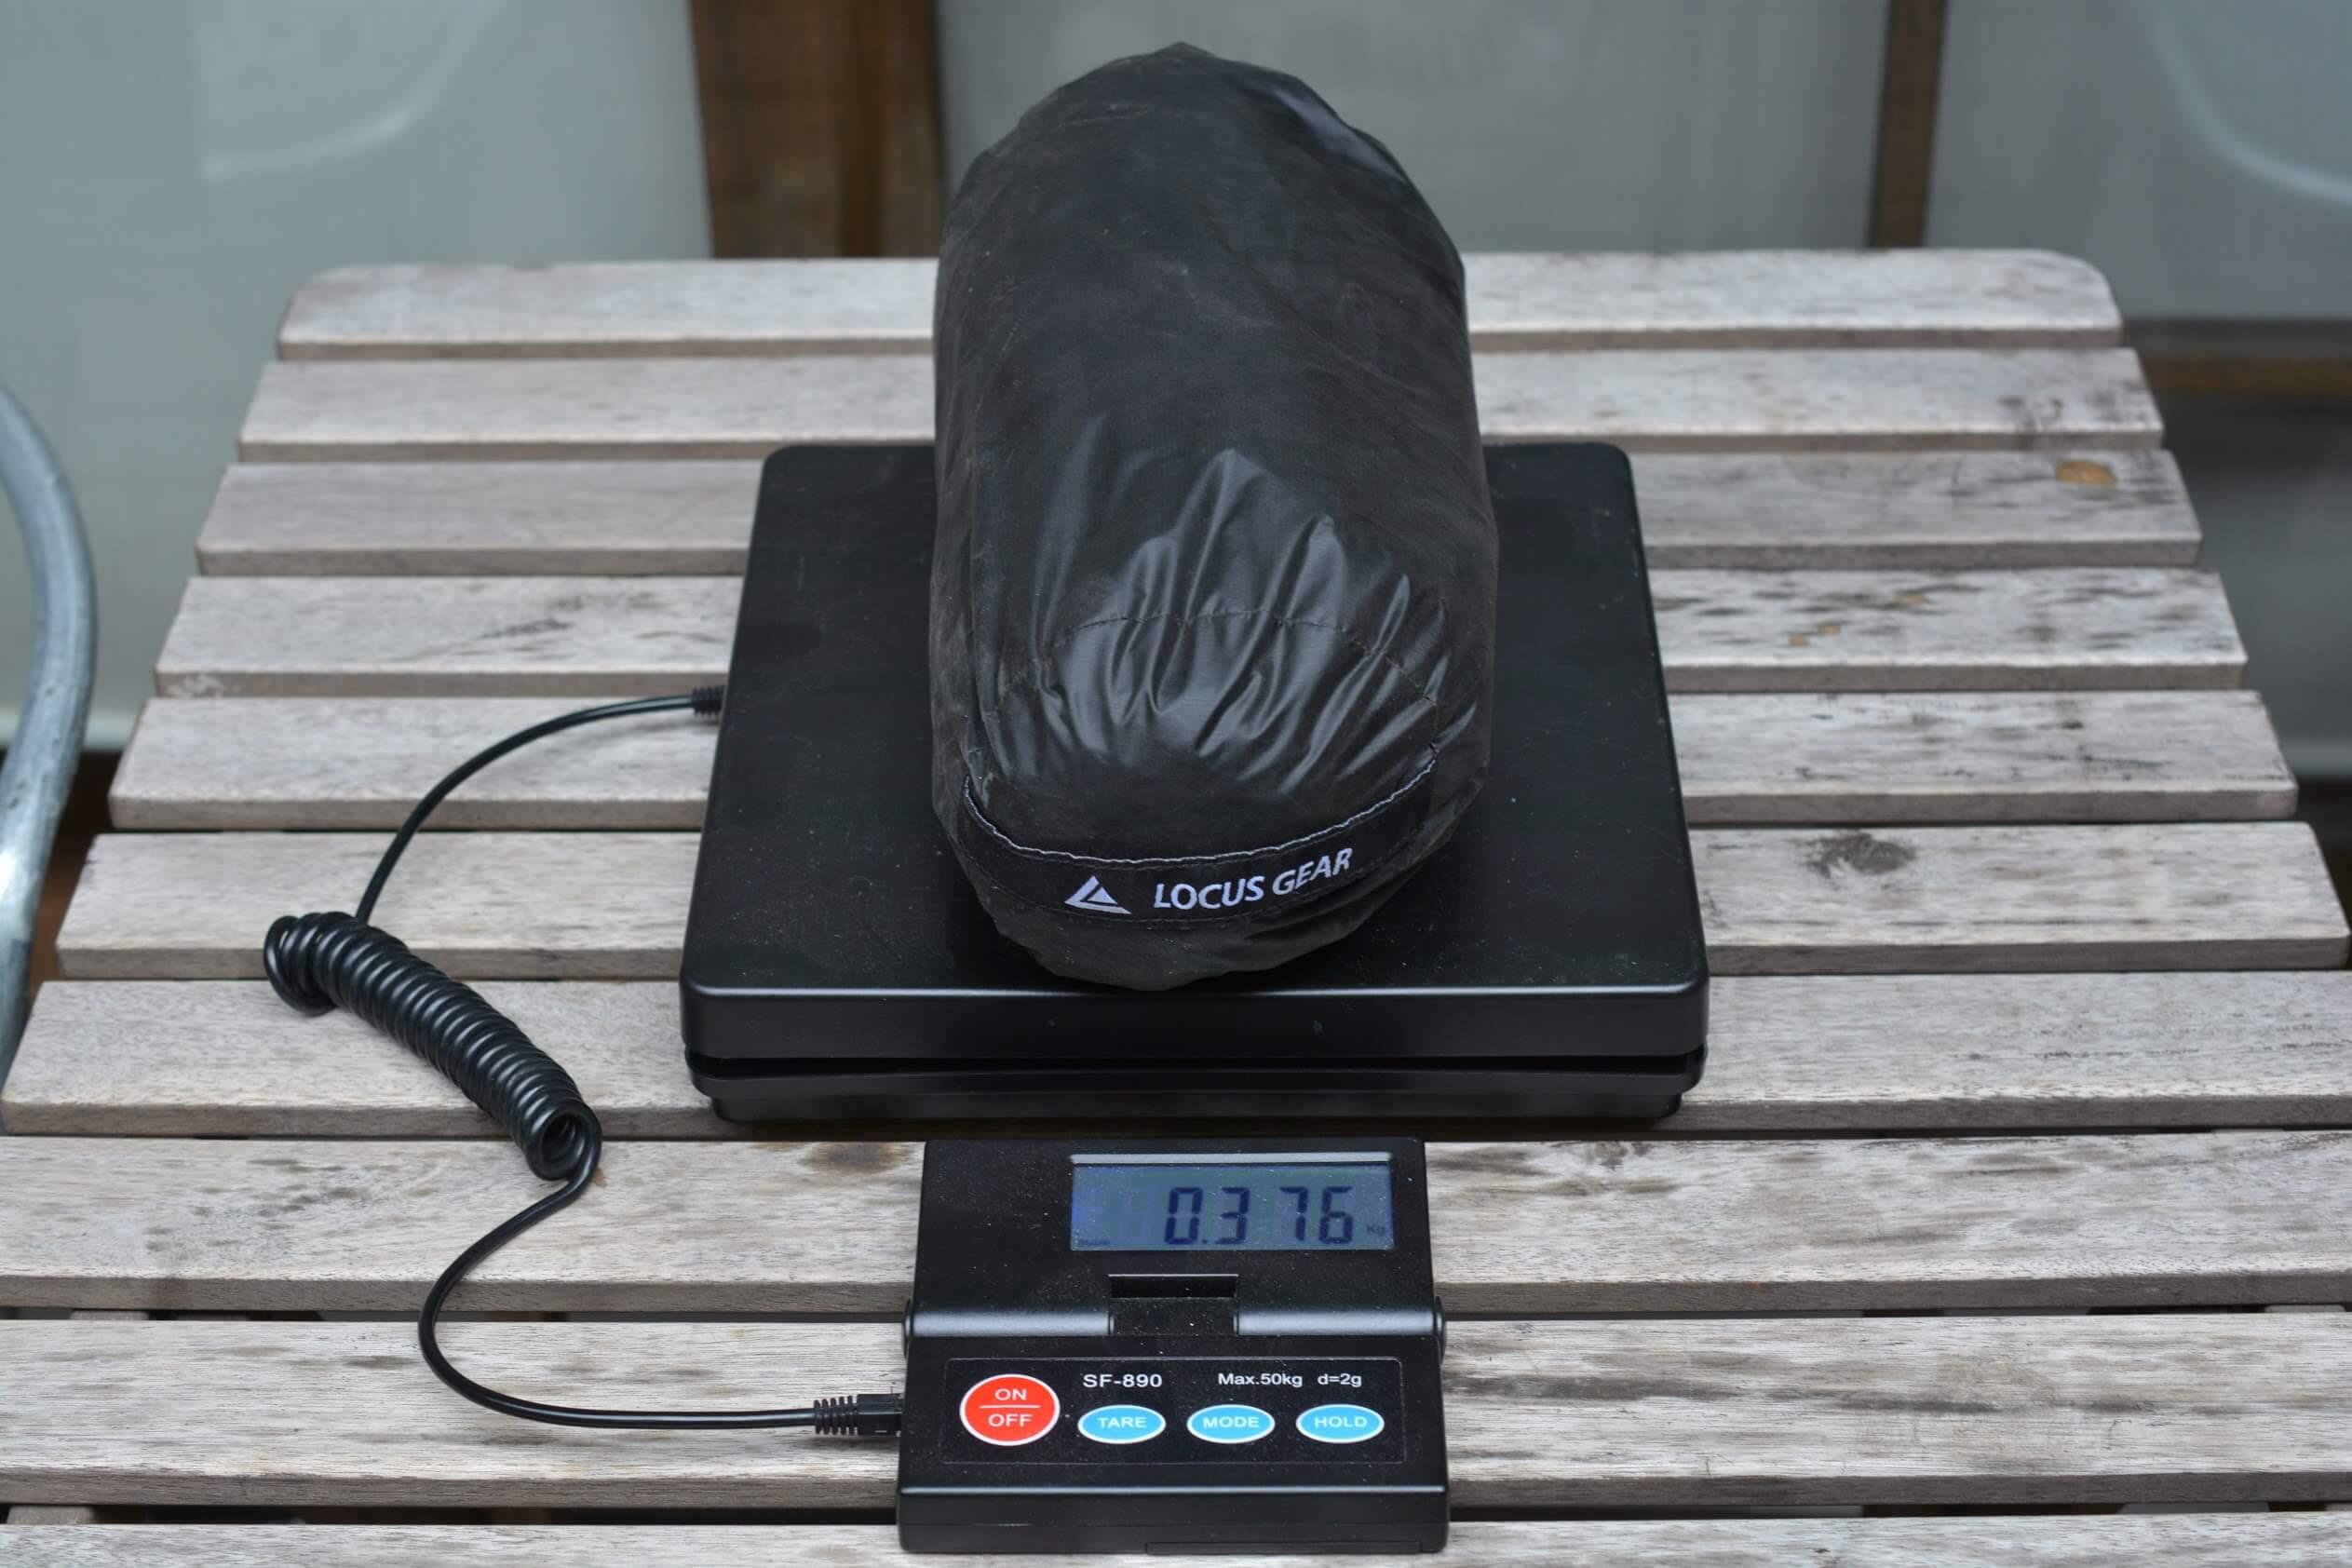 LocusGear Khufu HB / ローカスギア クフHB インナーメッシュ 重量